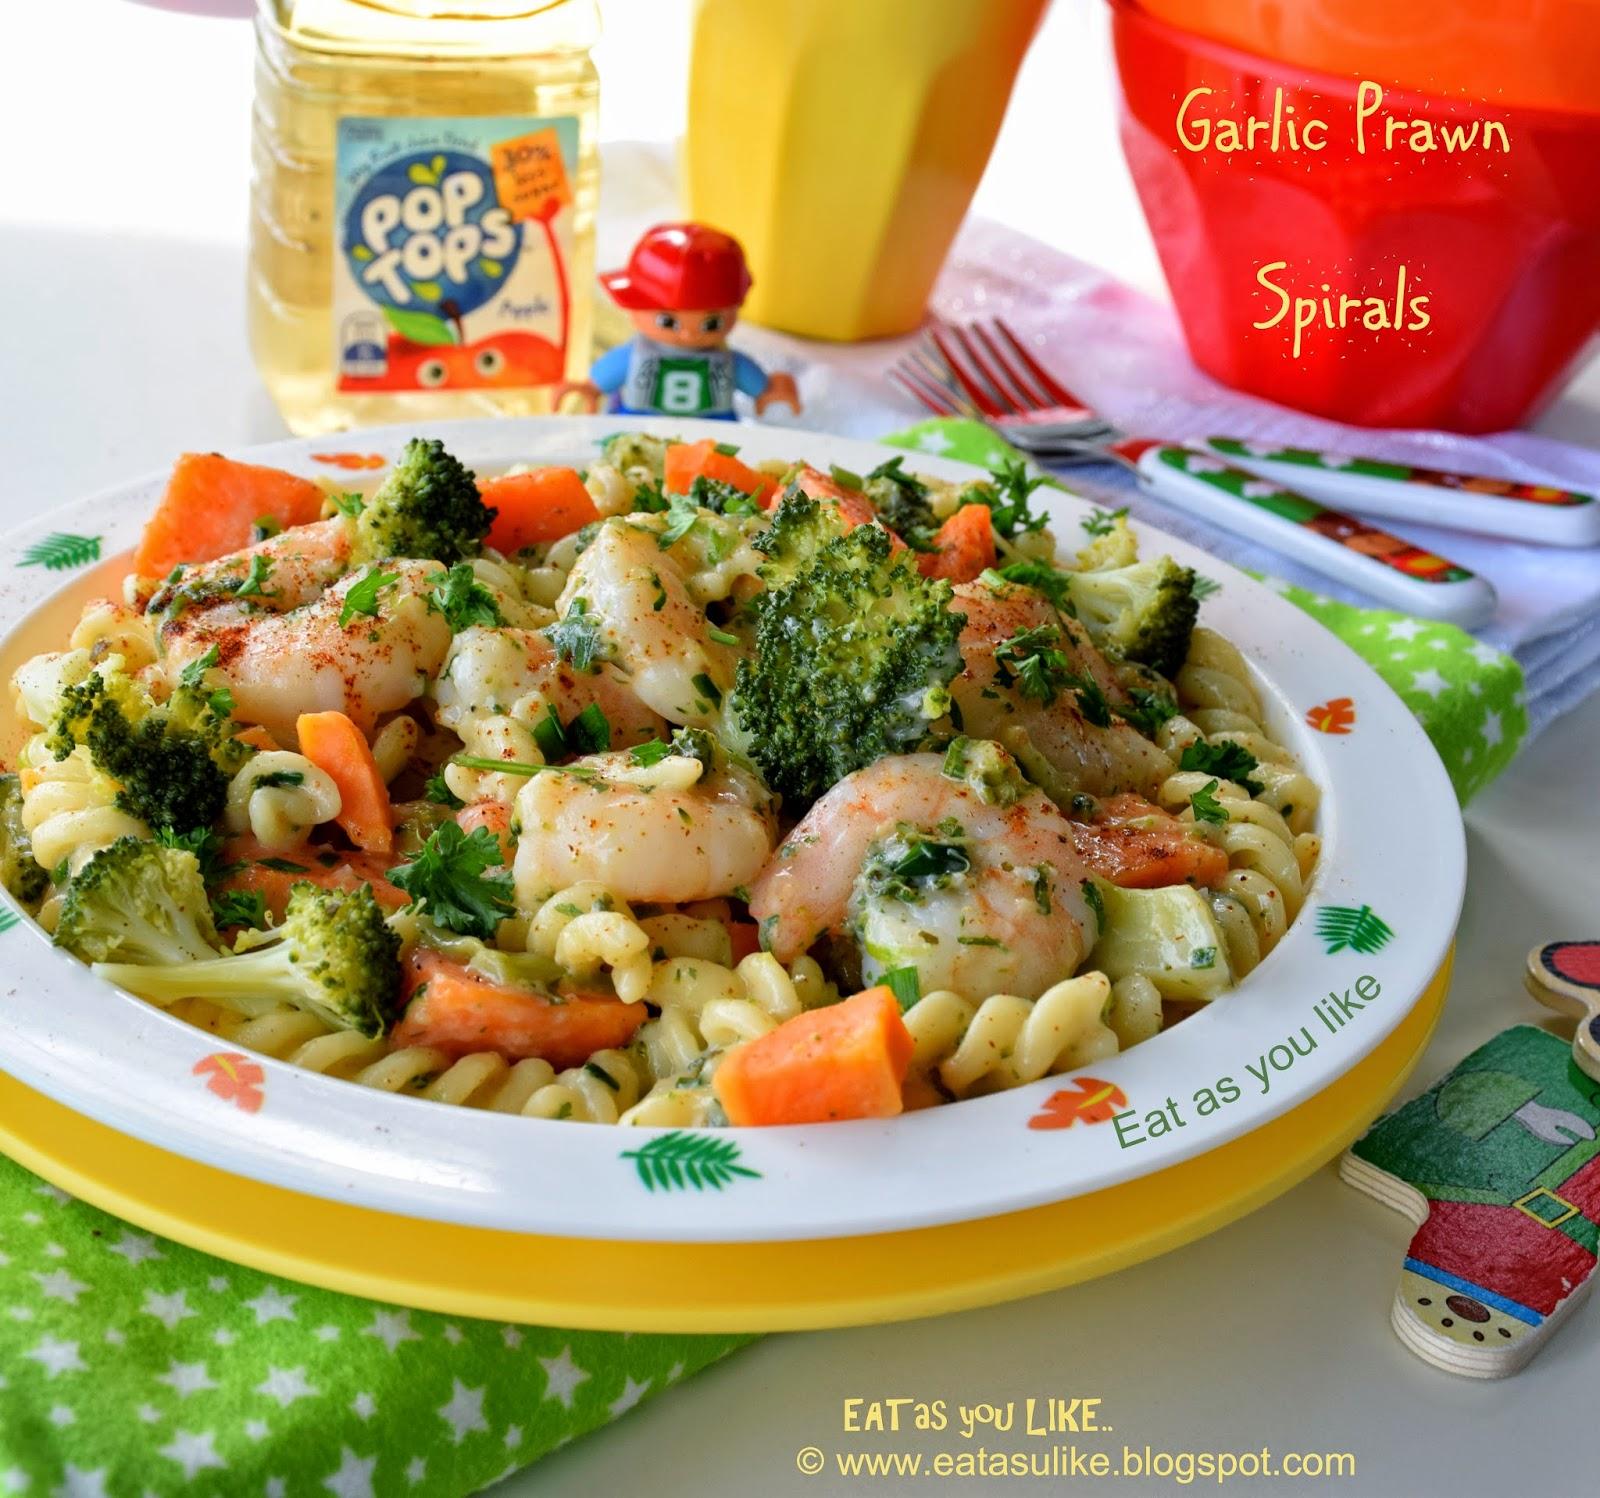 http://eatasulike.blogspot.com.au/2014/04/garlic-prawn-spirals.html